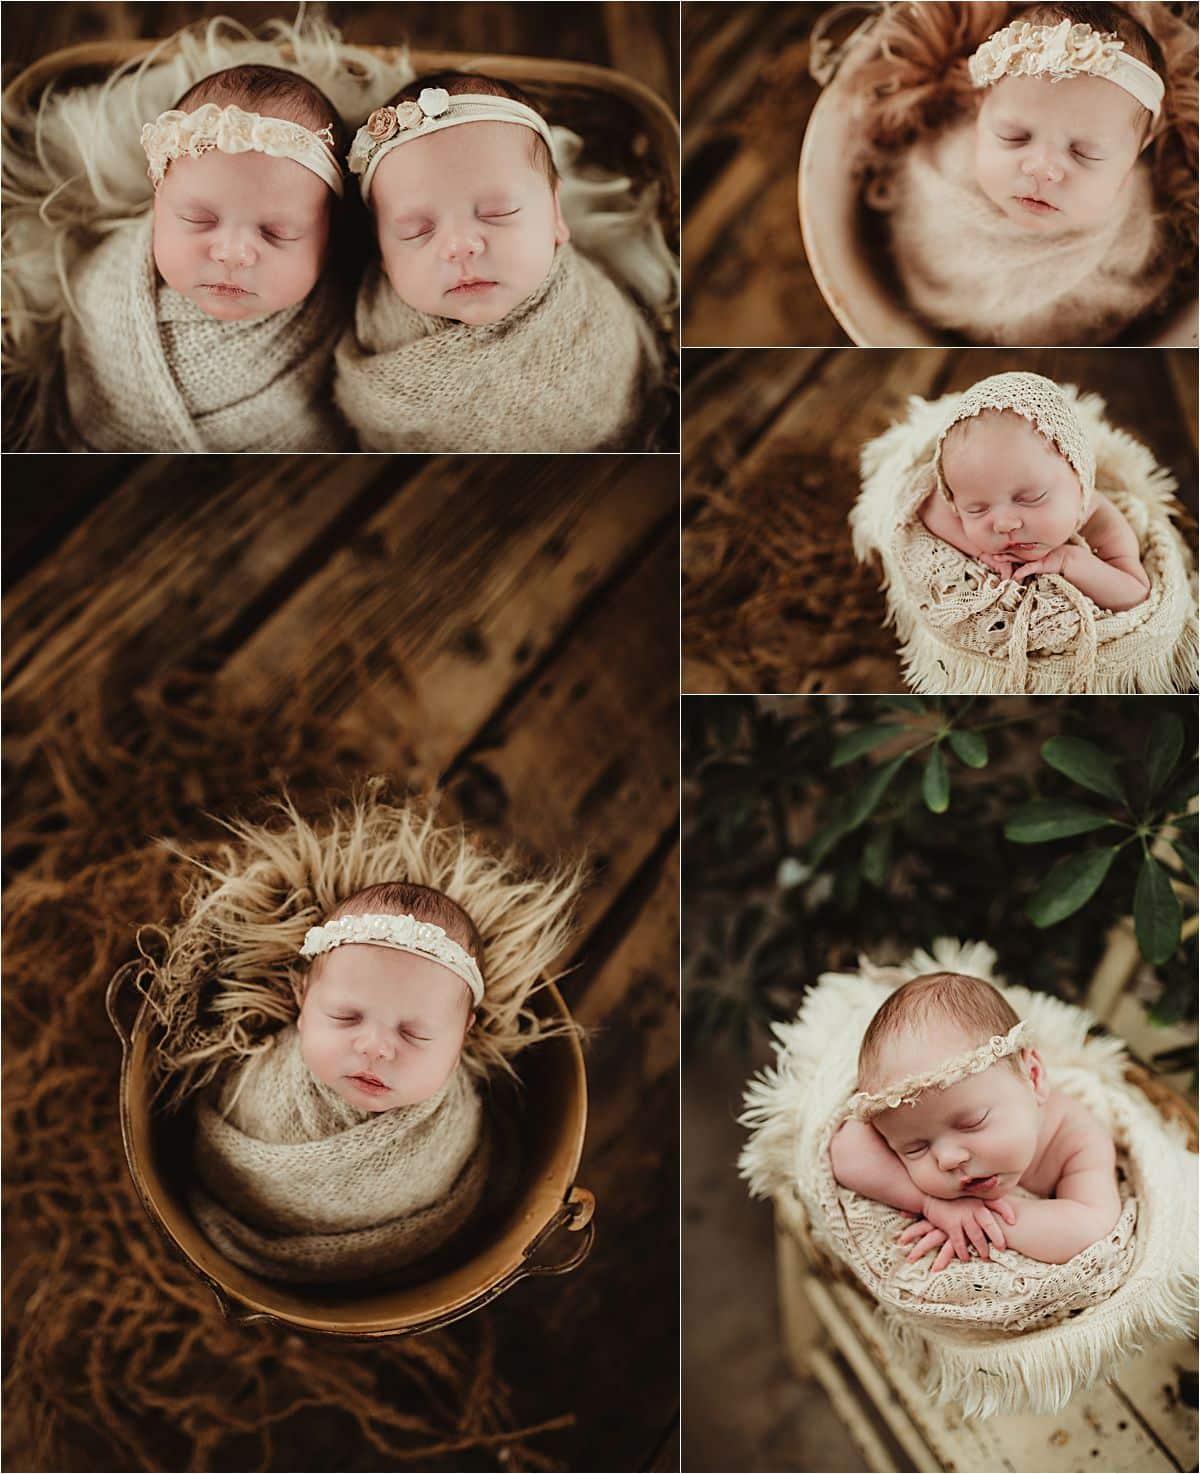 Twins Newborn Studio Session Collage Newborn Girls